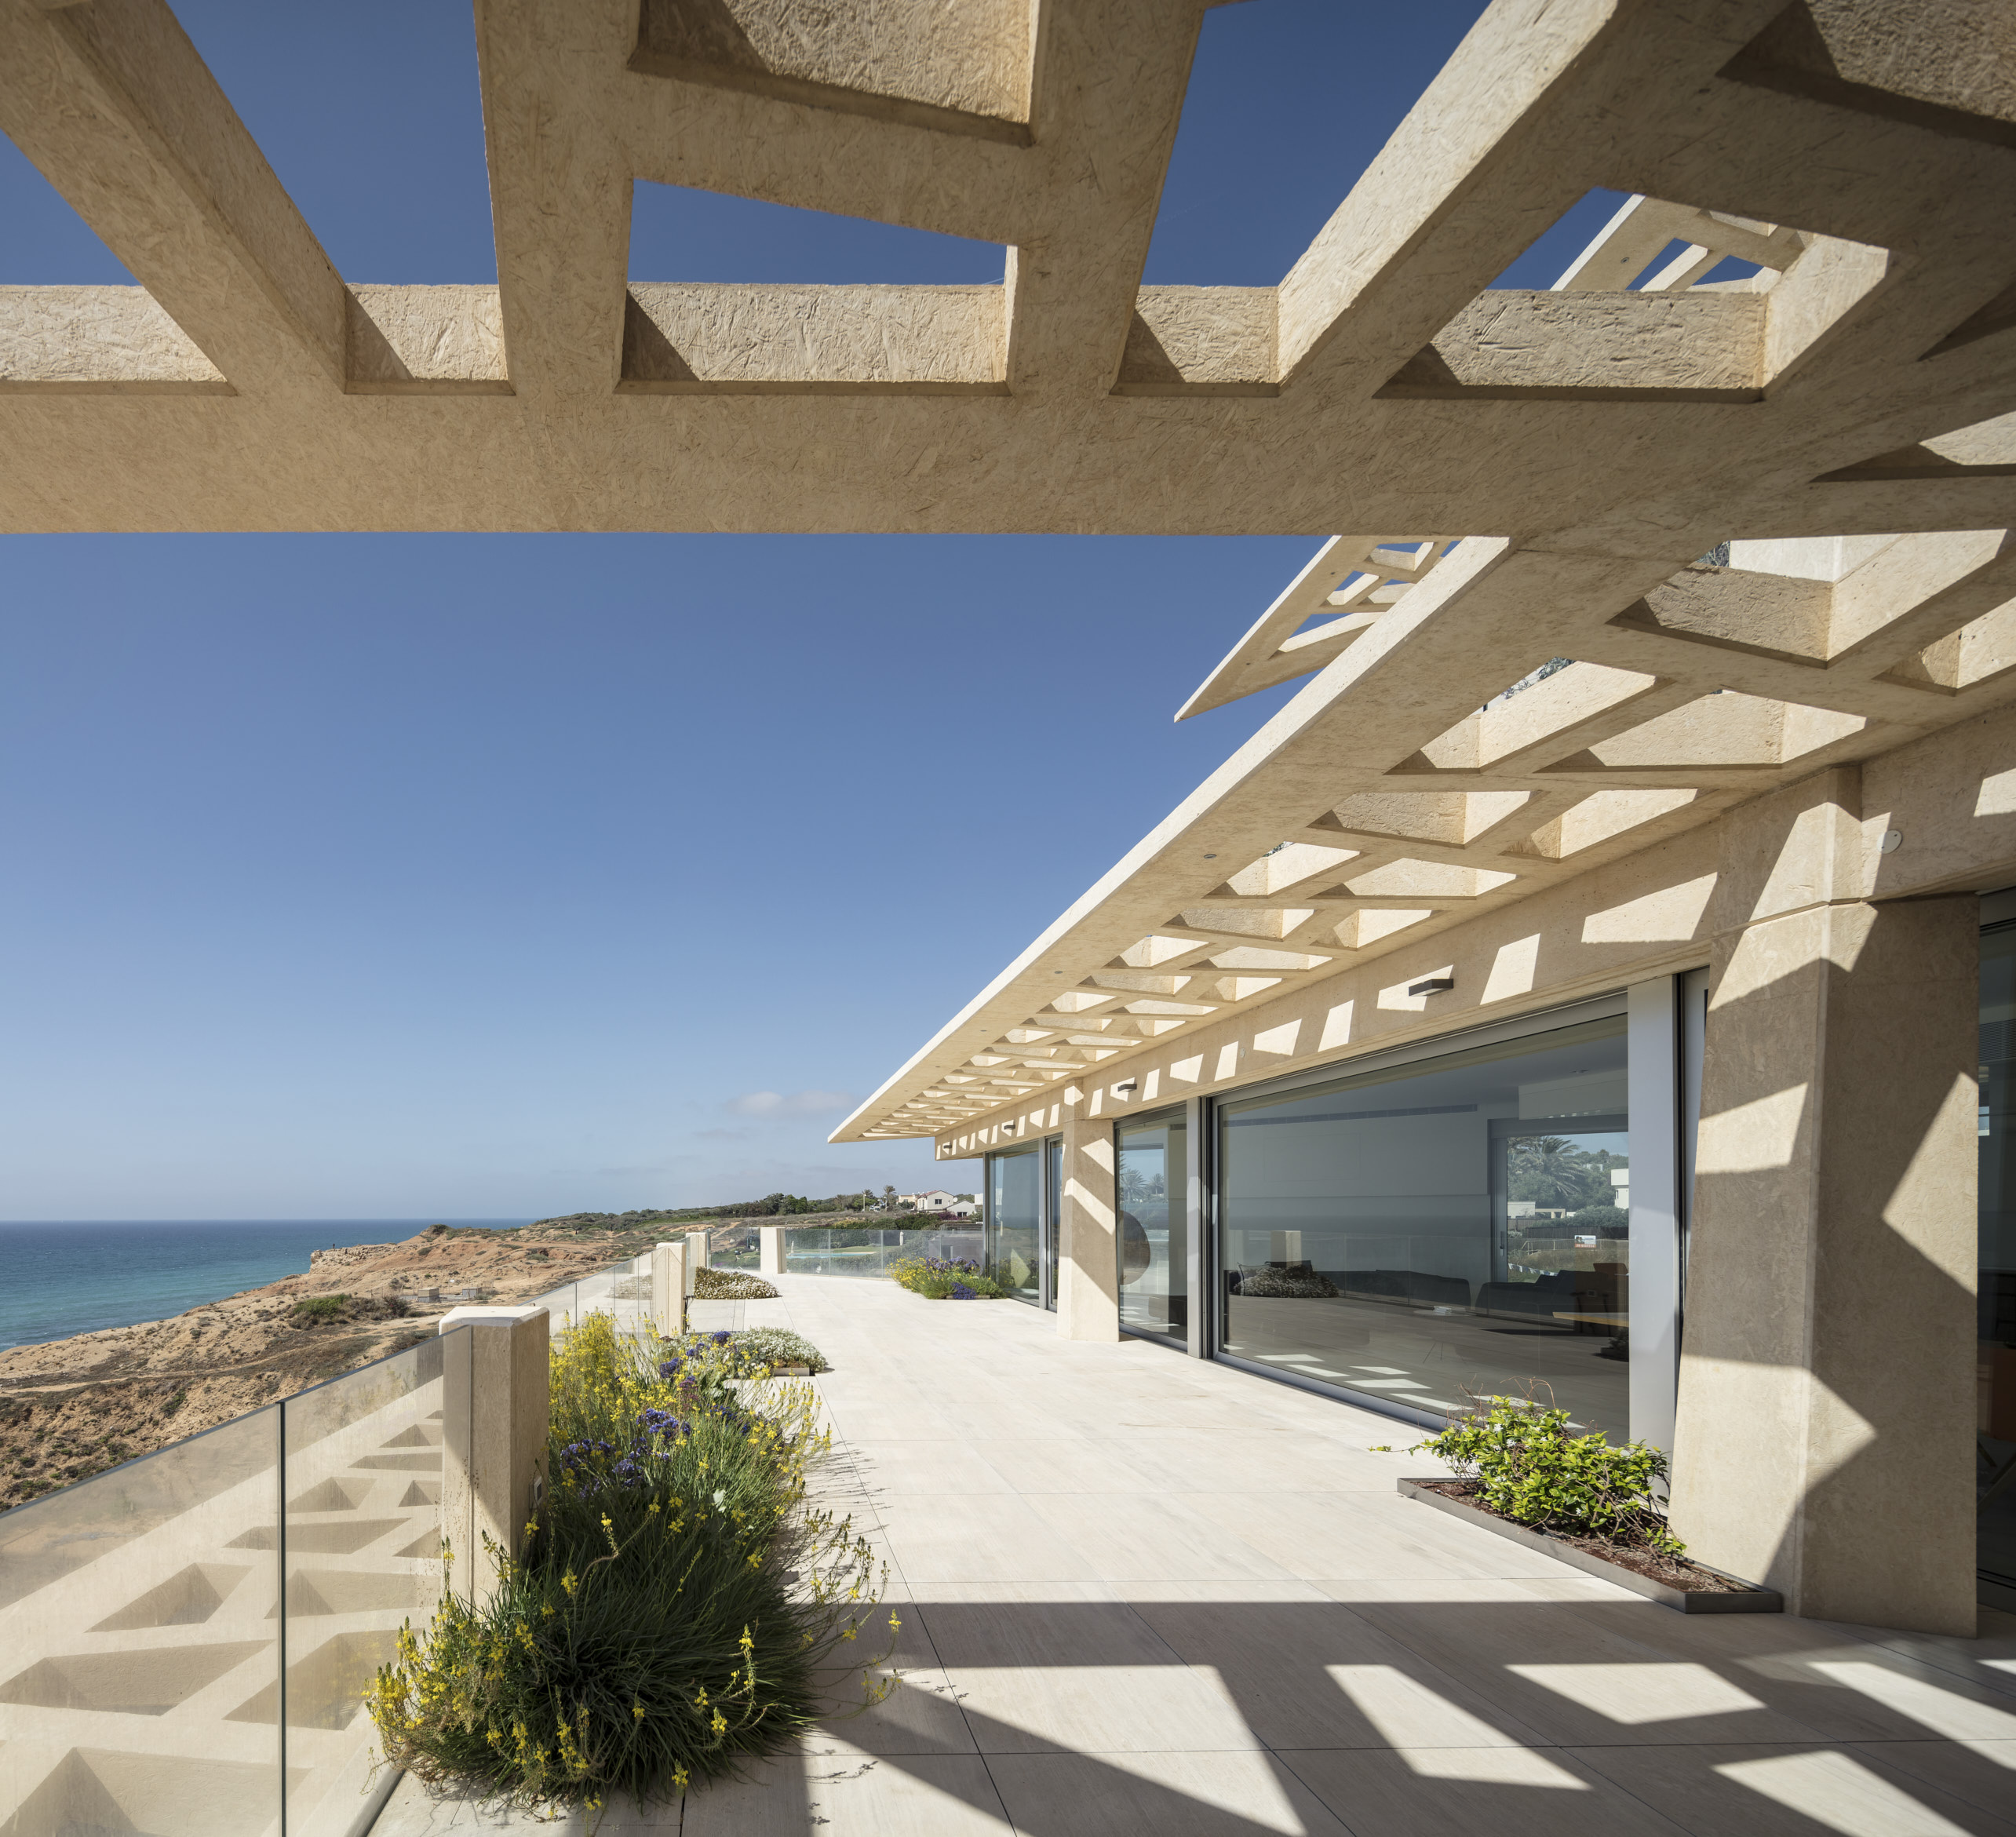 Gottesman-Szmelcman Architecture